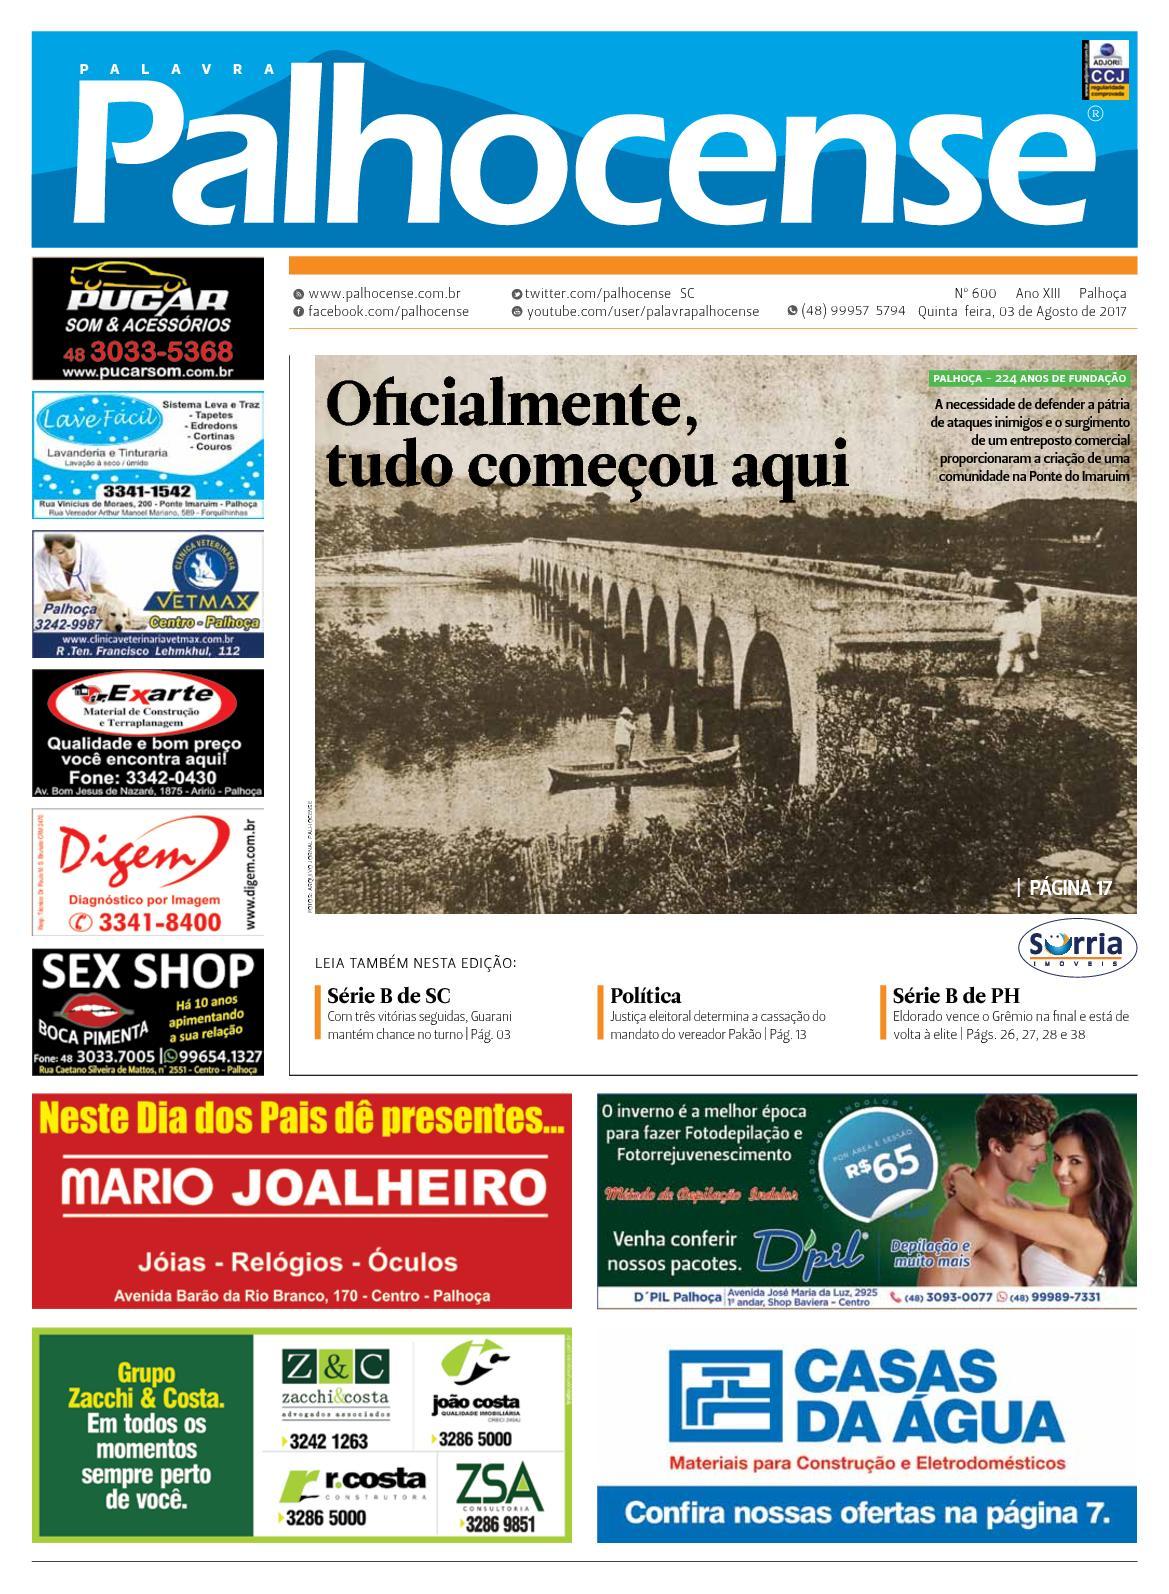 JORNAL PALAVRA PALHOCENSE - EDIÇÃO 600